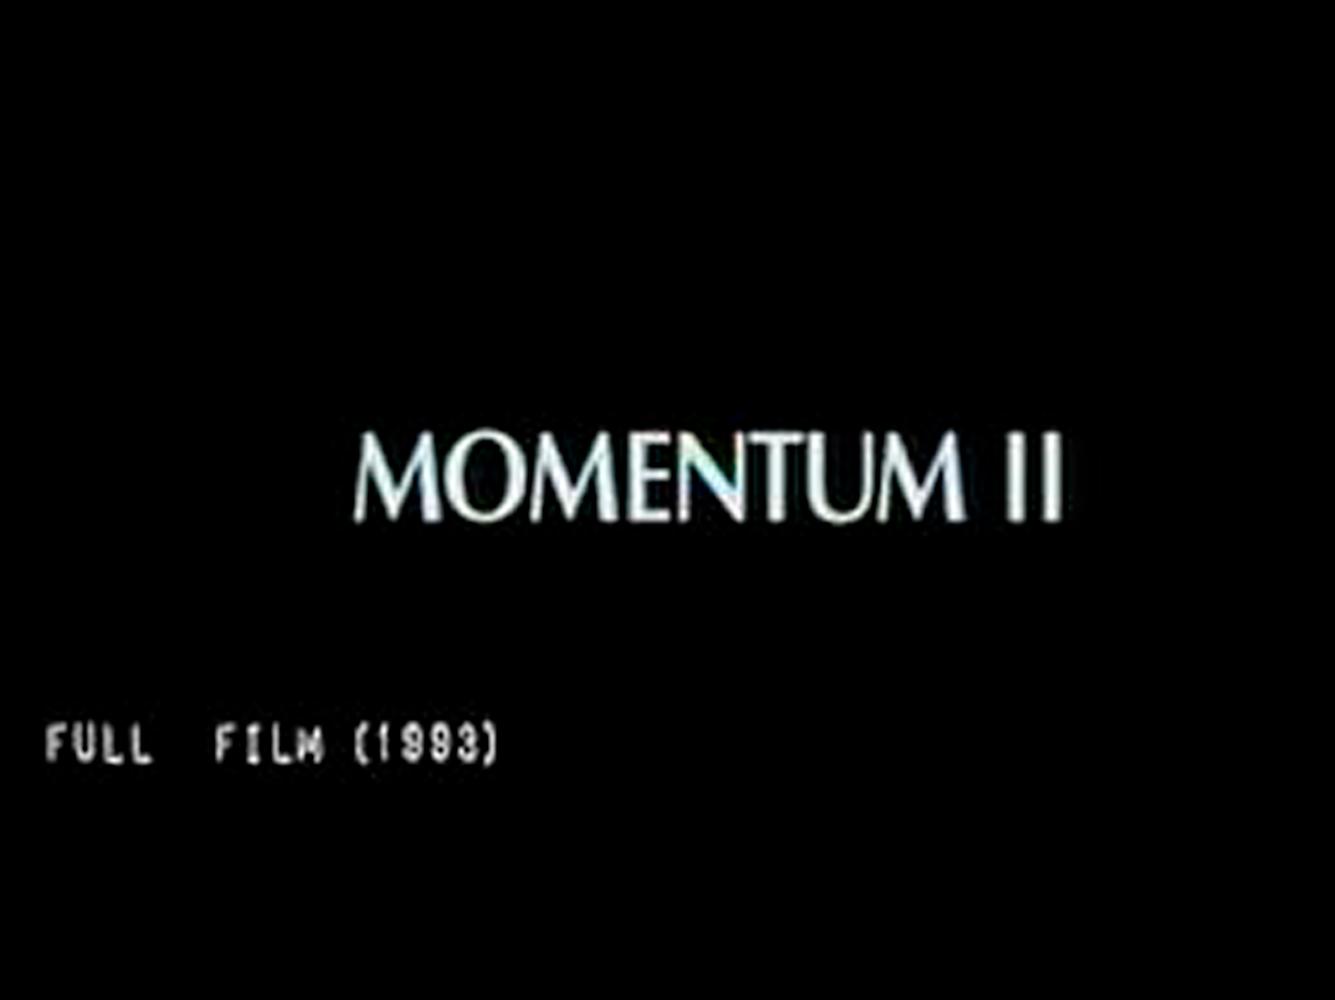 momentummargruesa